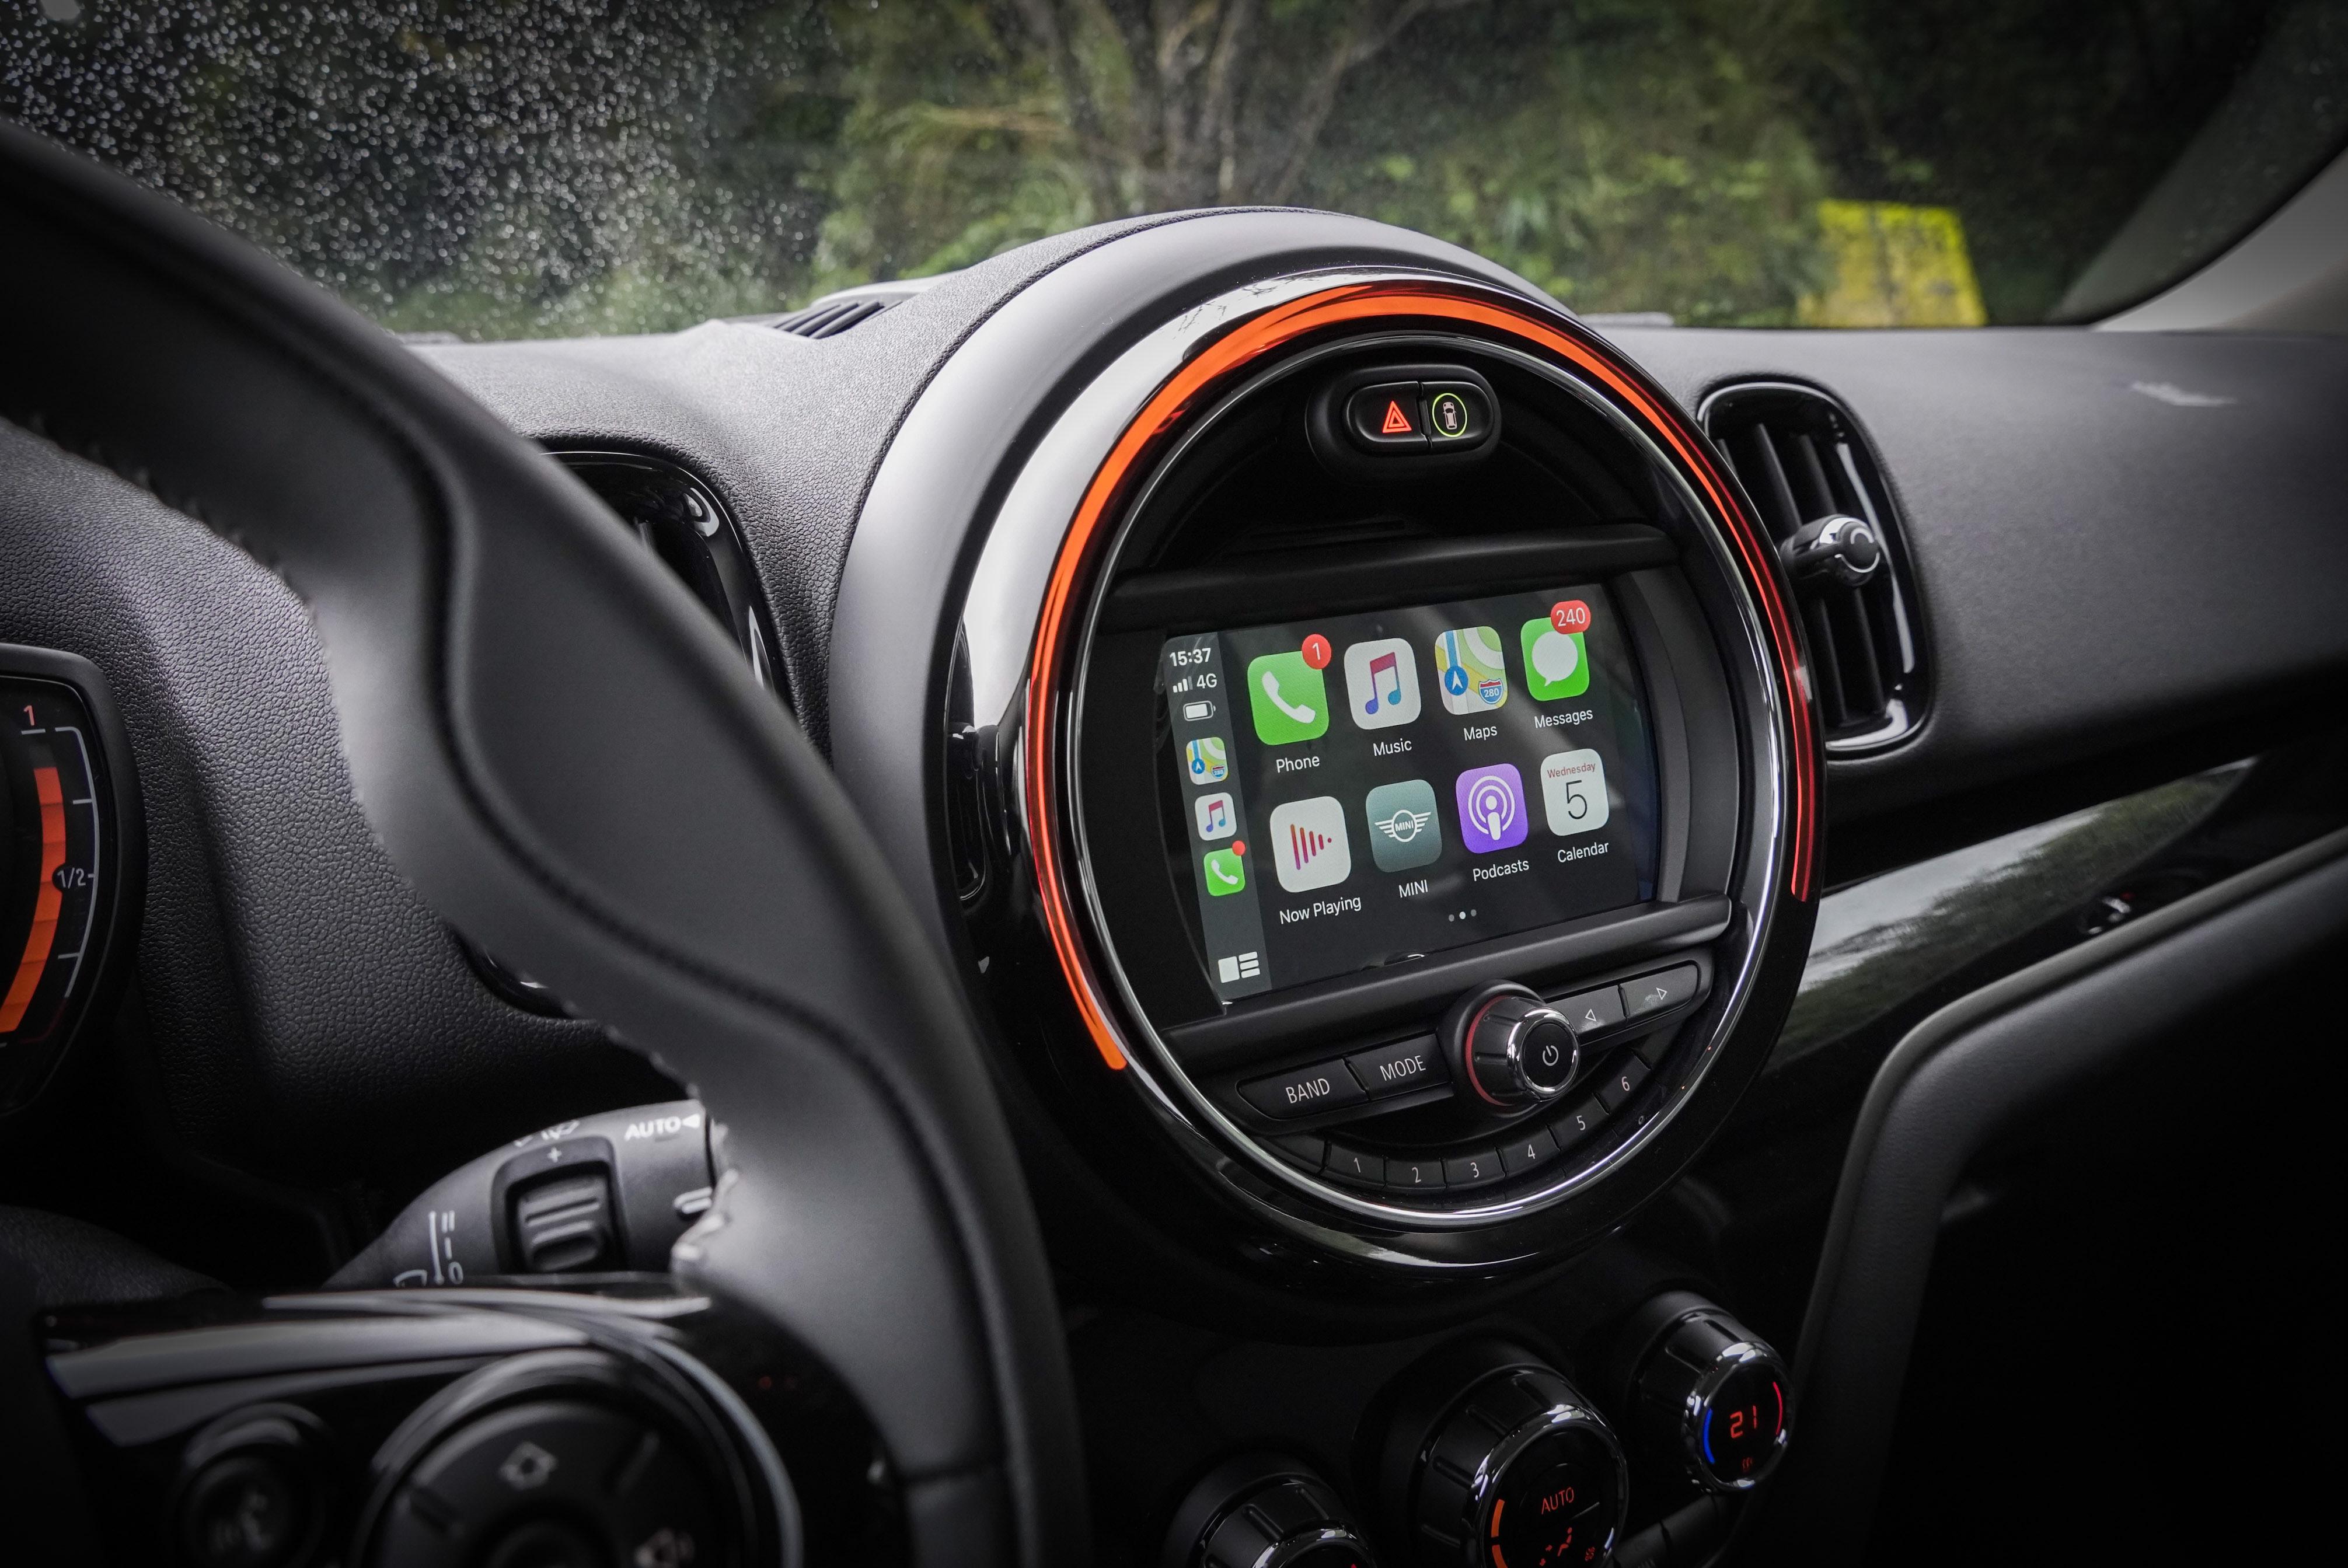 MINI Visual Boost 6.5 吋觸控螢幕,中文衛星導航系統、Apple CarPlay 系統都是野營版套件內容。